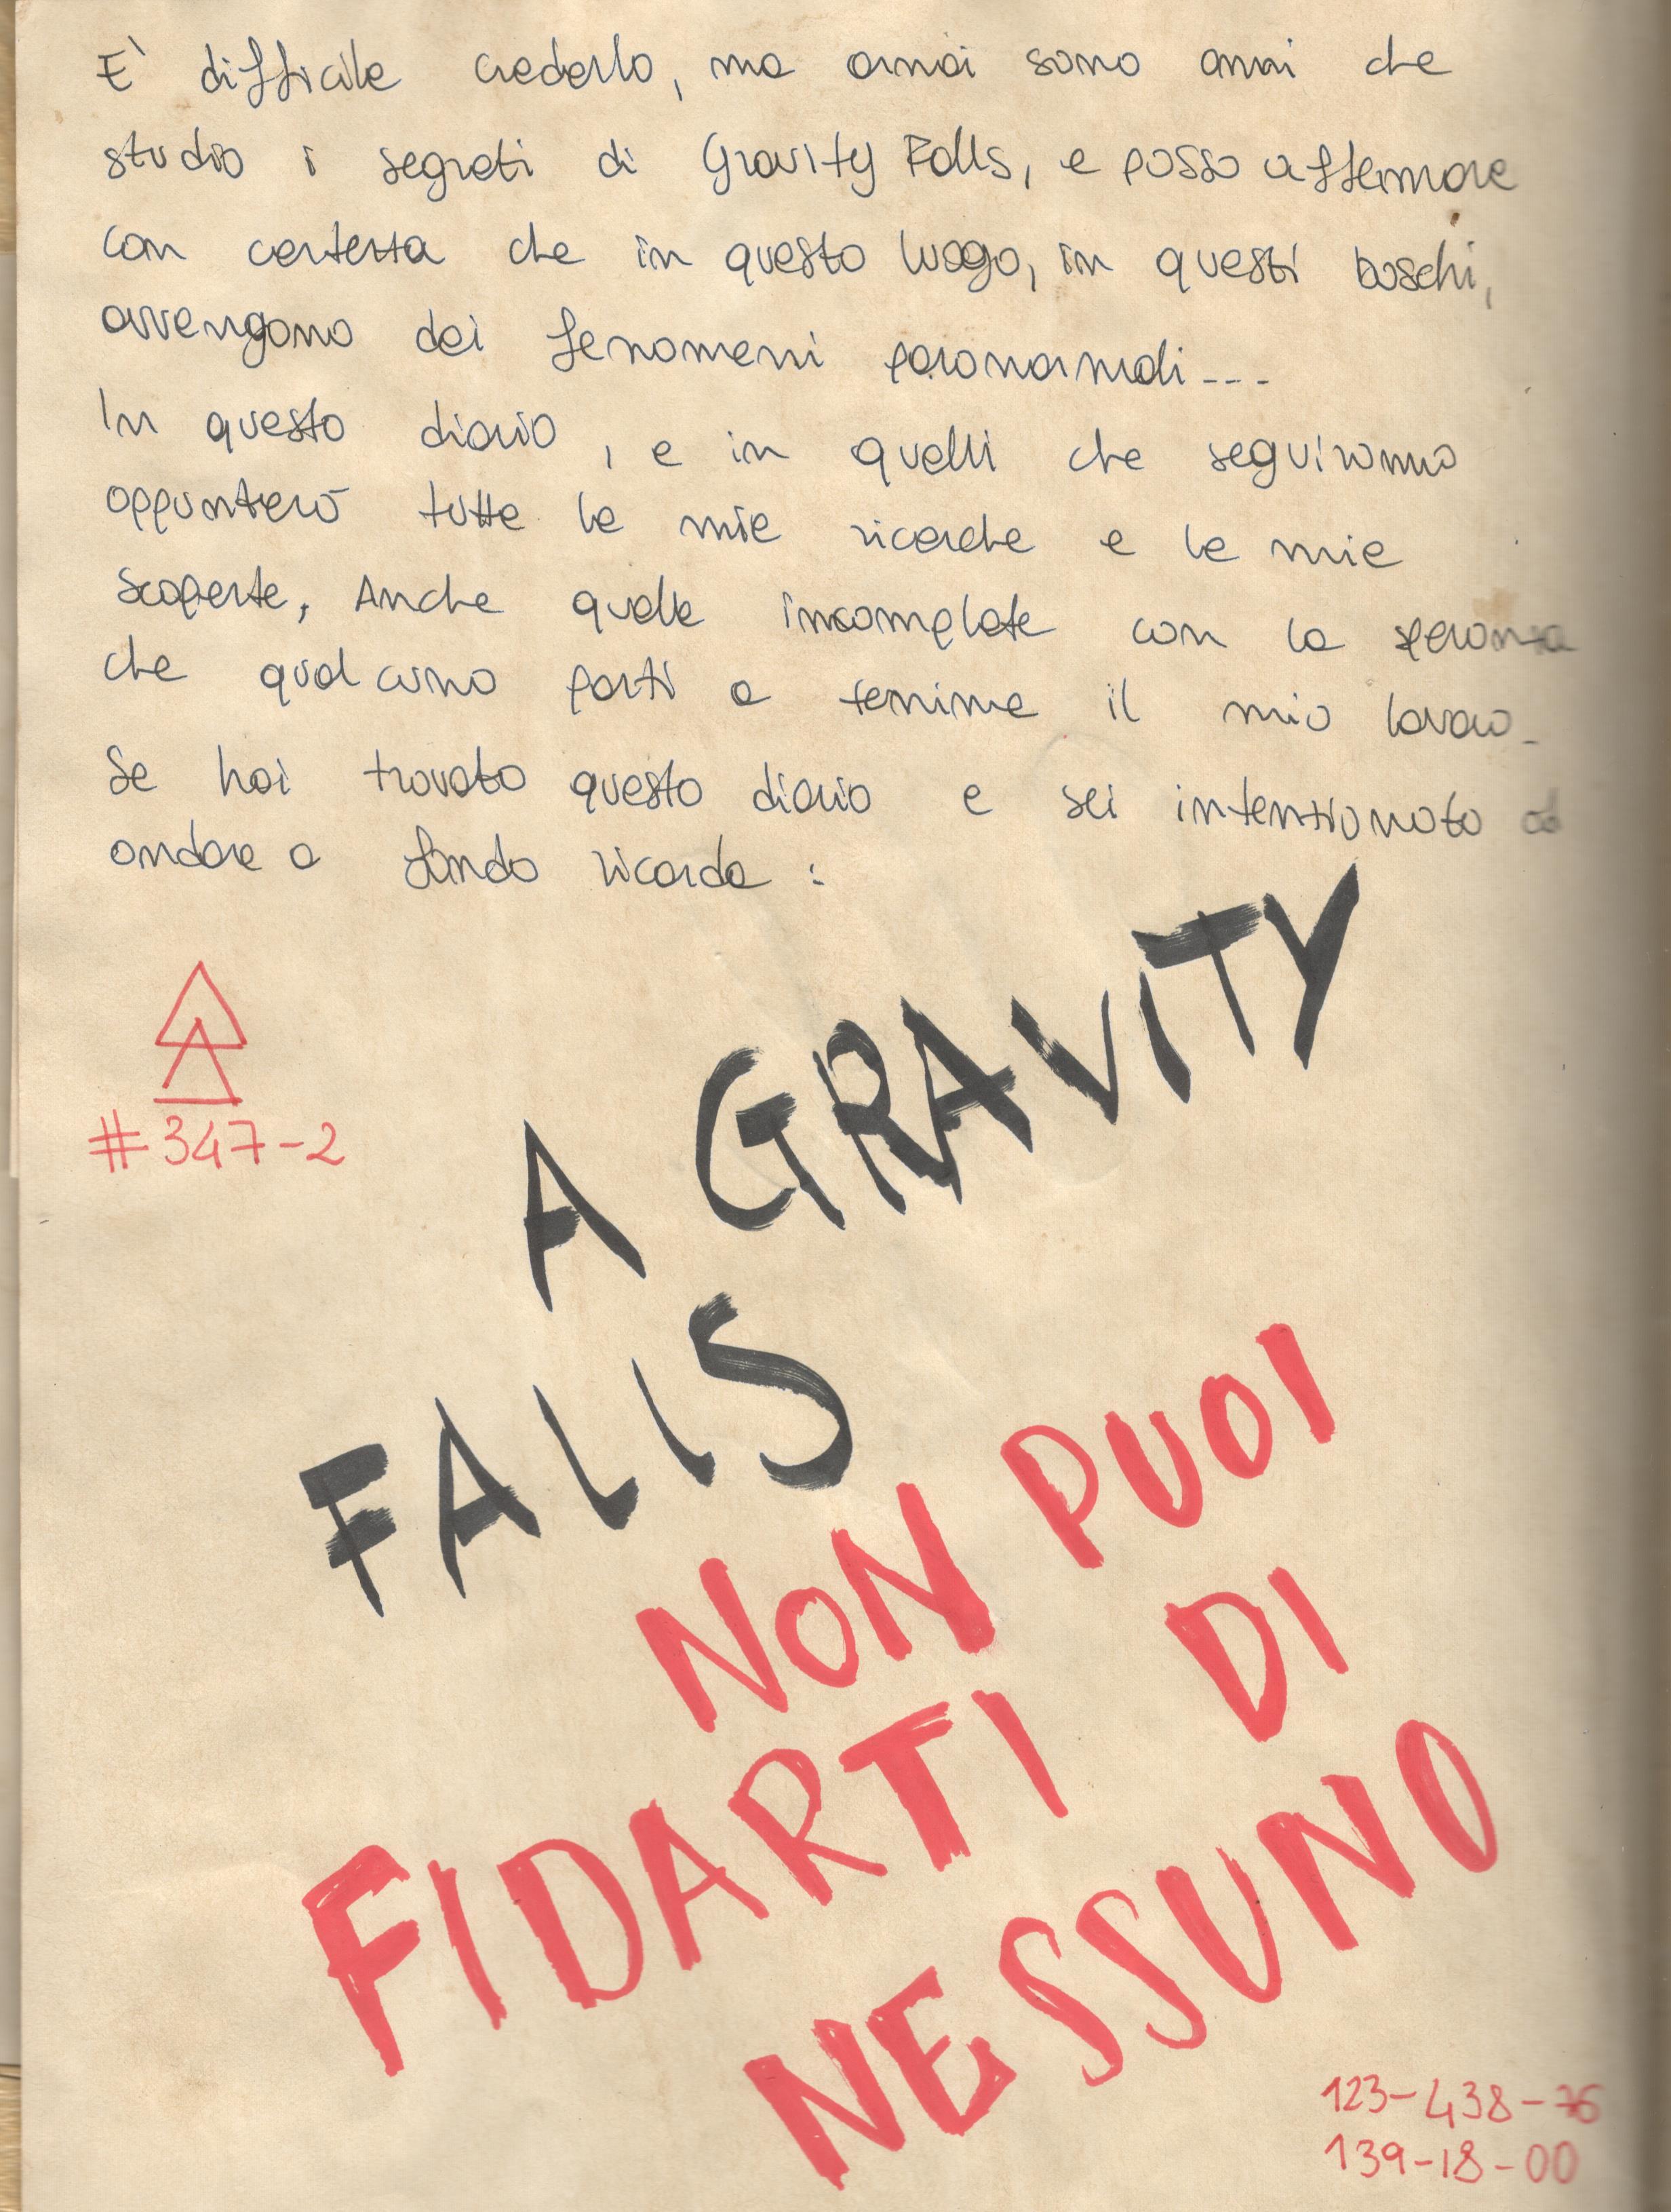 Diario_01_Gravity_Falls_Meschia_2019_-4